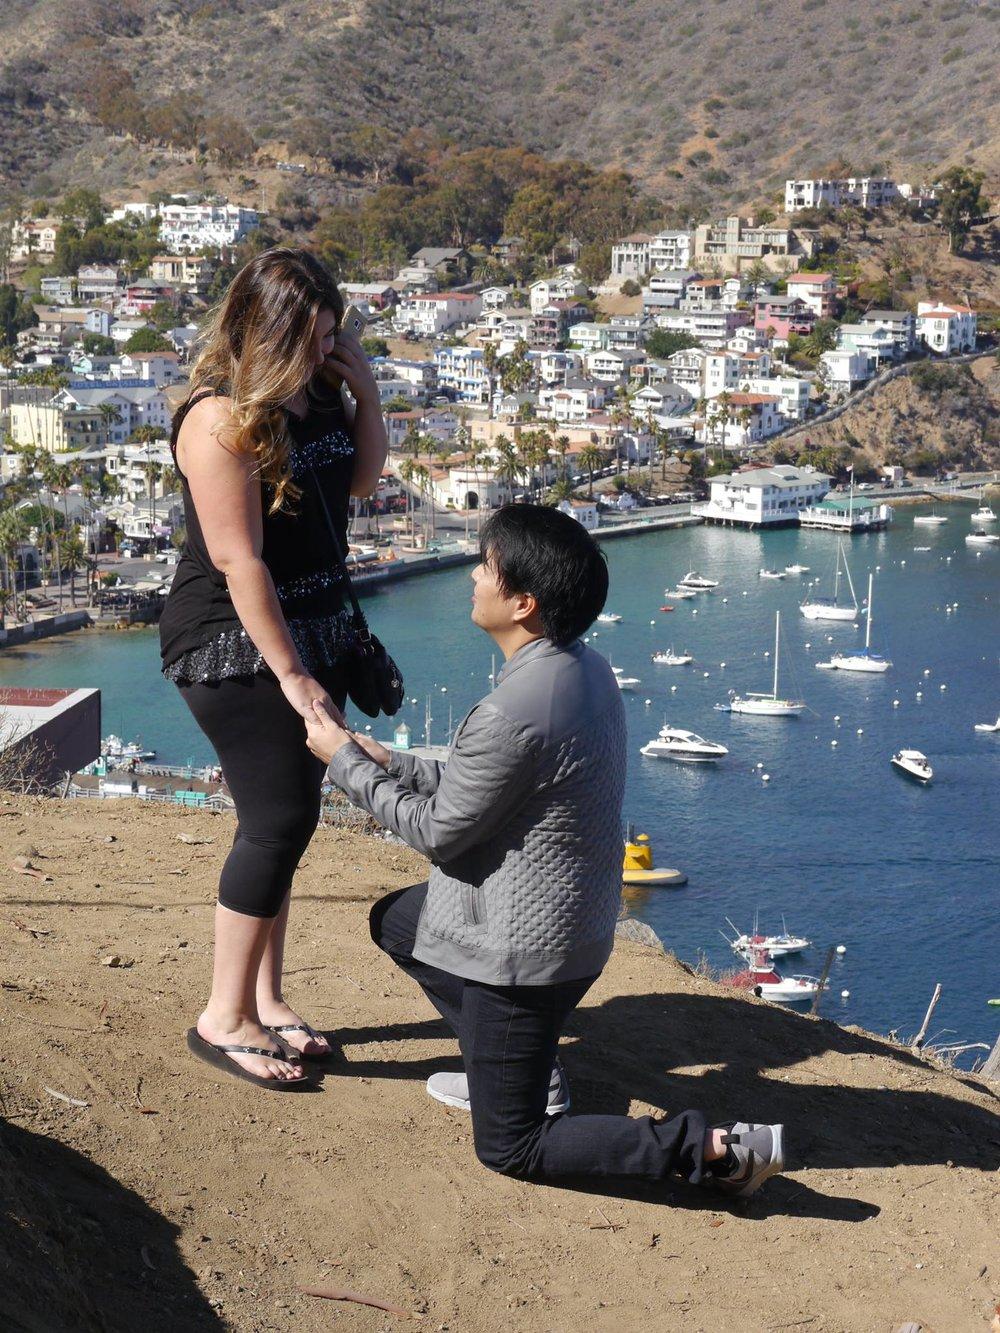 Julius proposing with his custom designed Elegant Fantasy engagement ring by Takayas